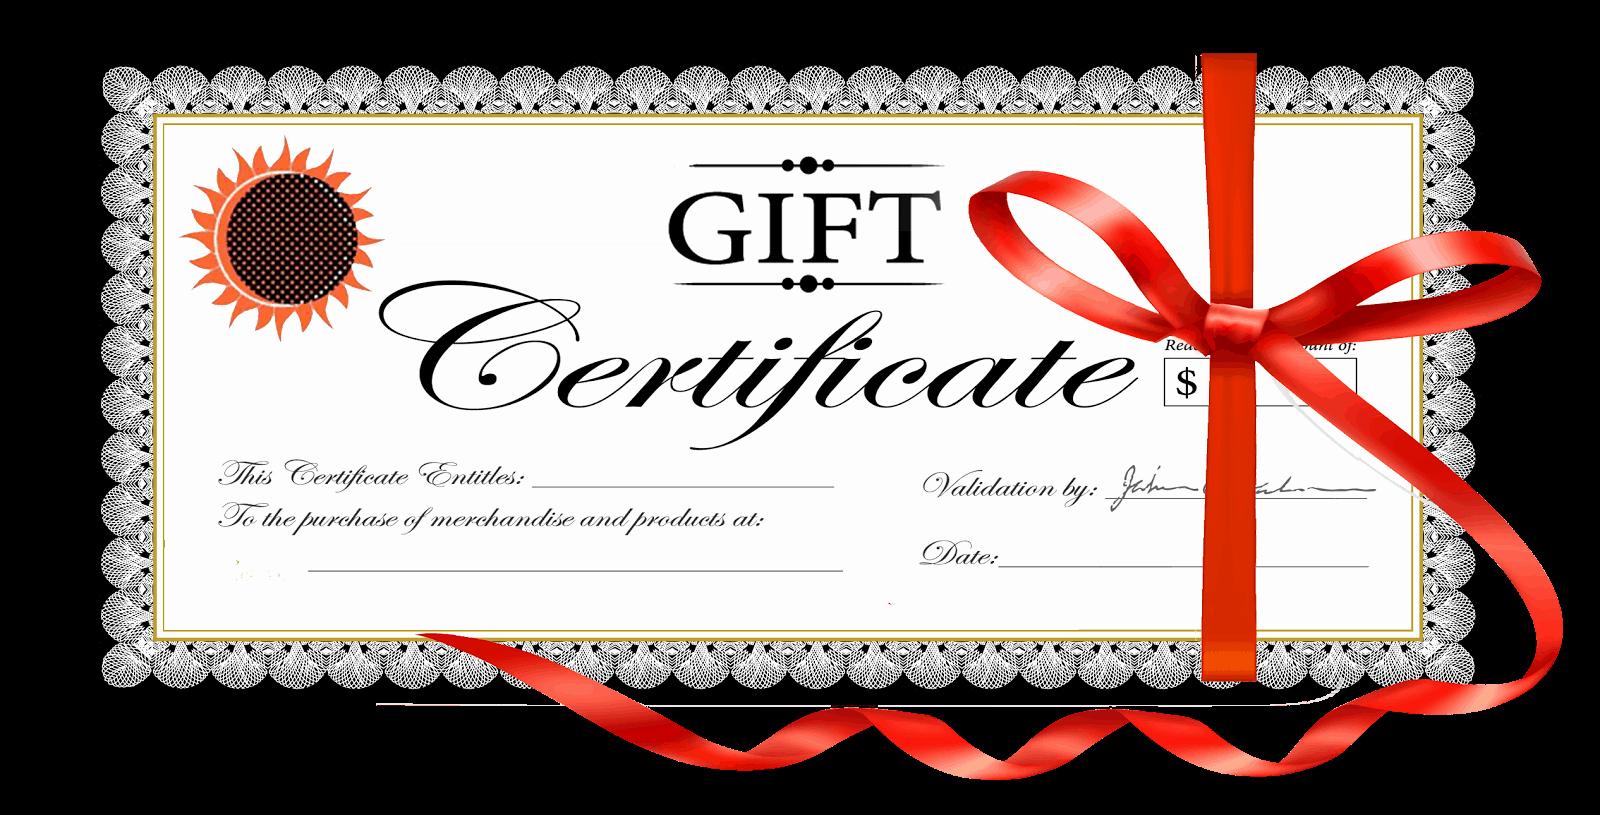 Horseback Riding Gift Certificate Template Luxury 18 Gift Certificate Templates Excel Pdf formats